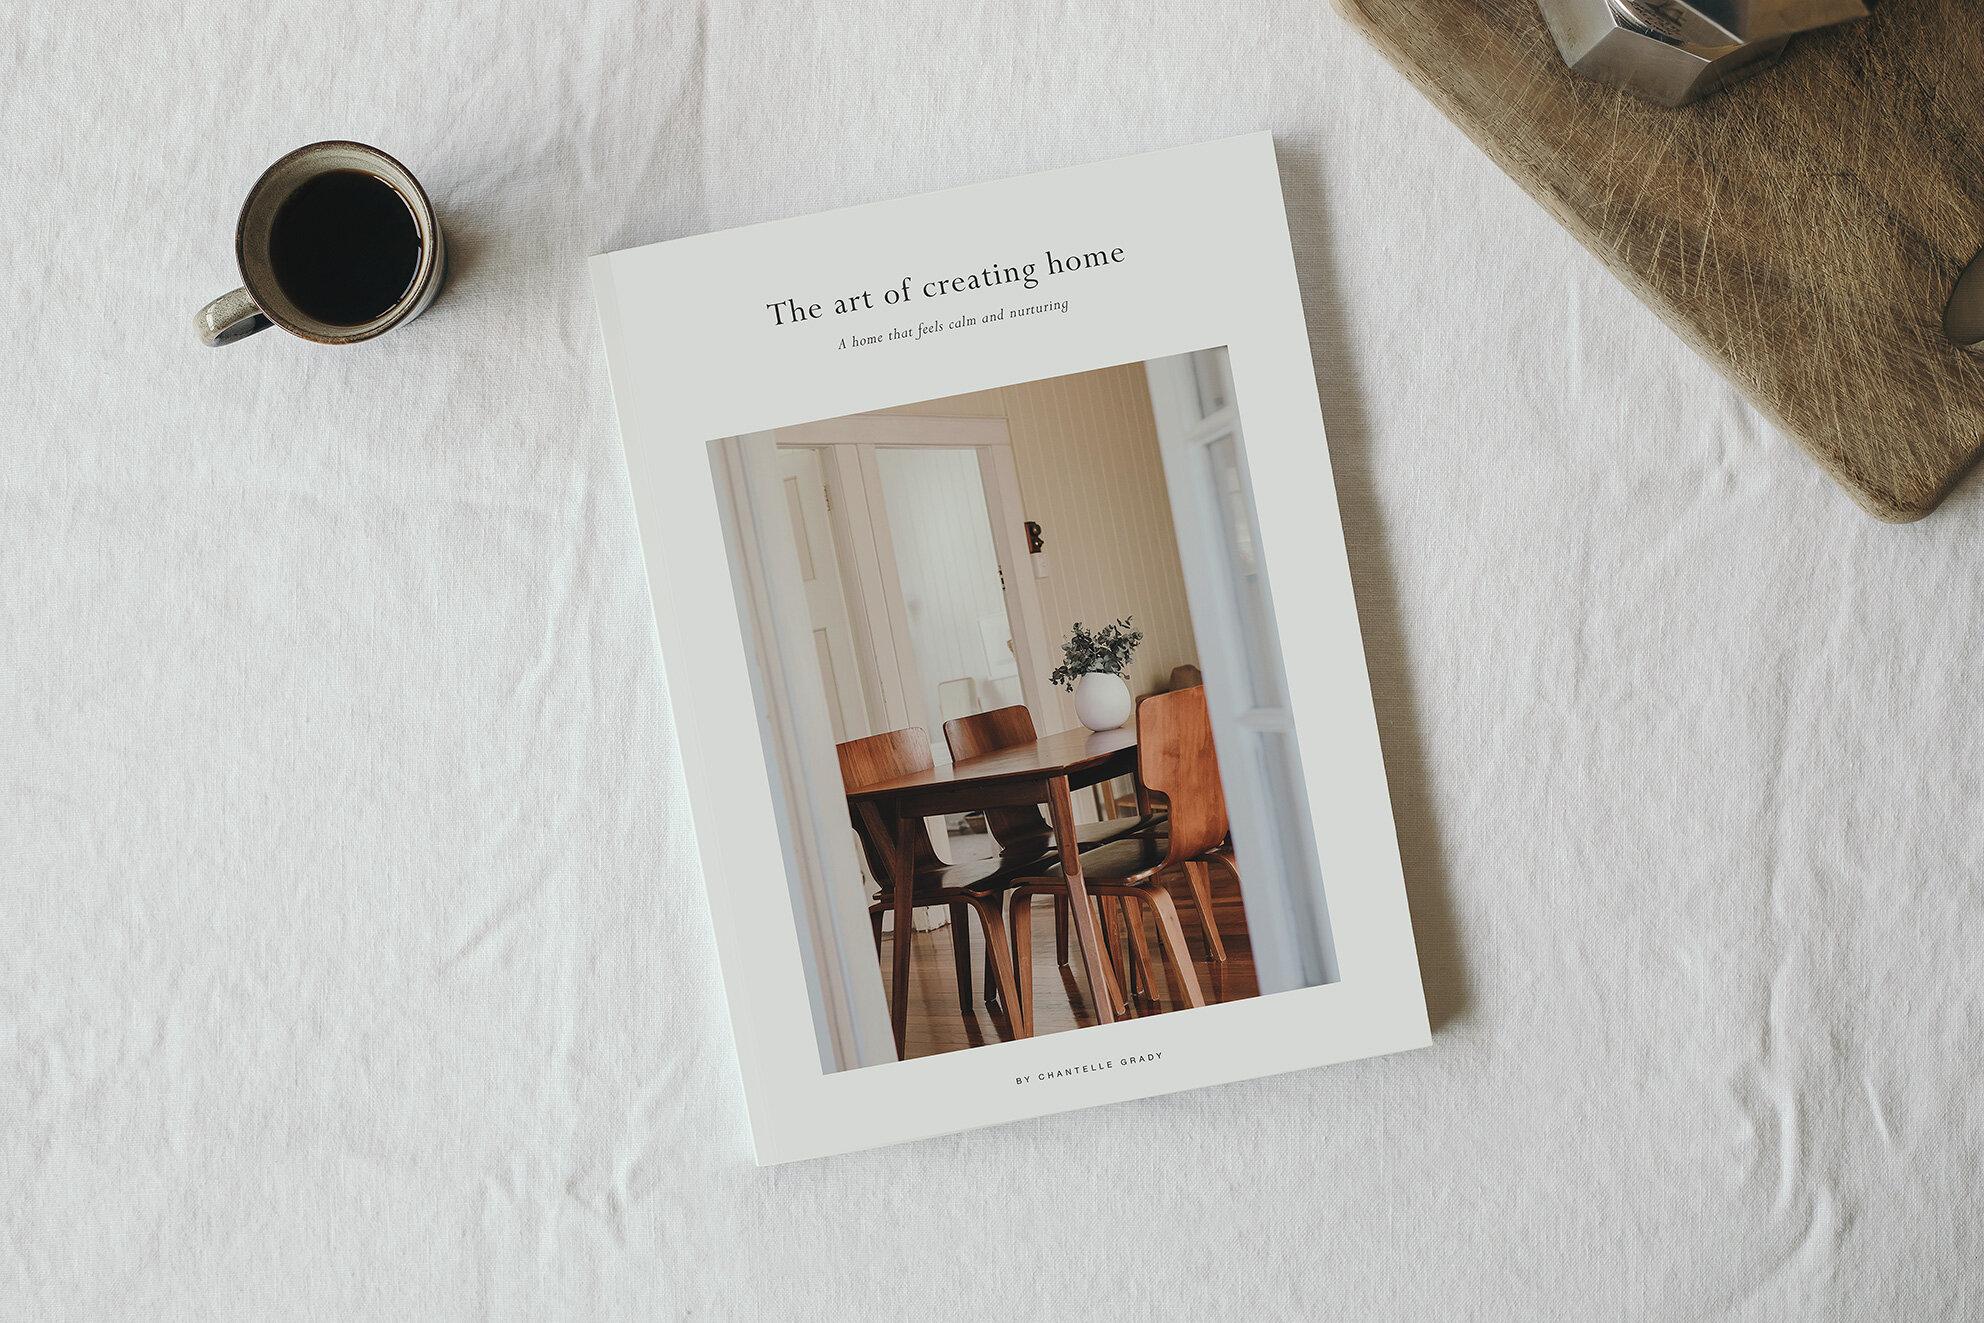 TheArtOfCreatingHomeEbook.jpg